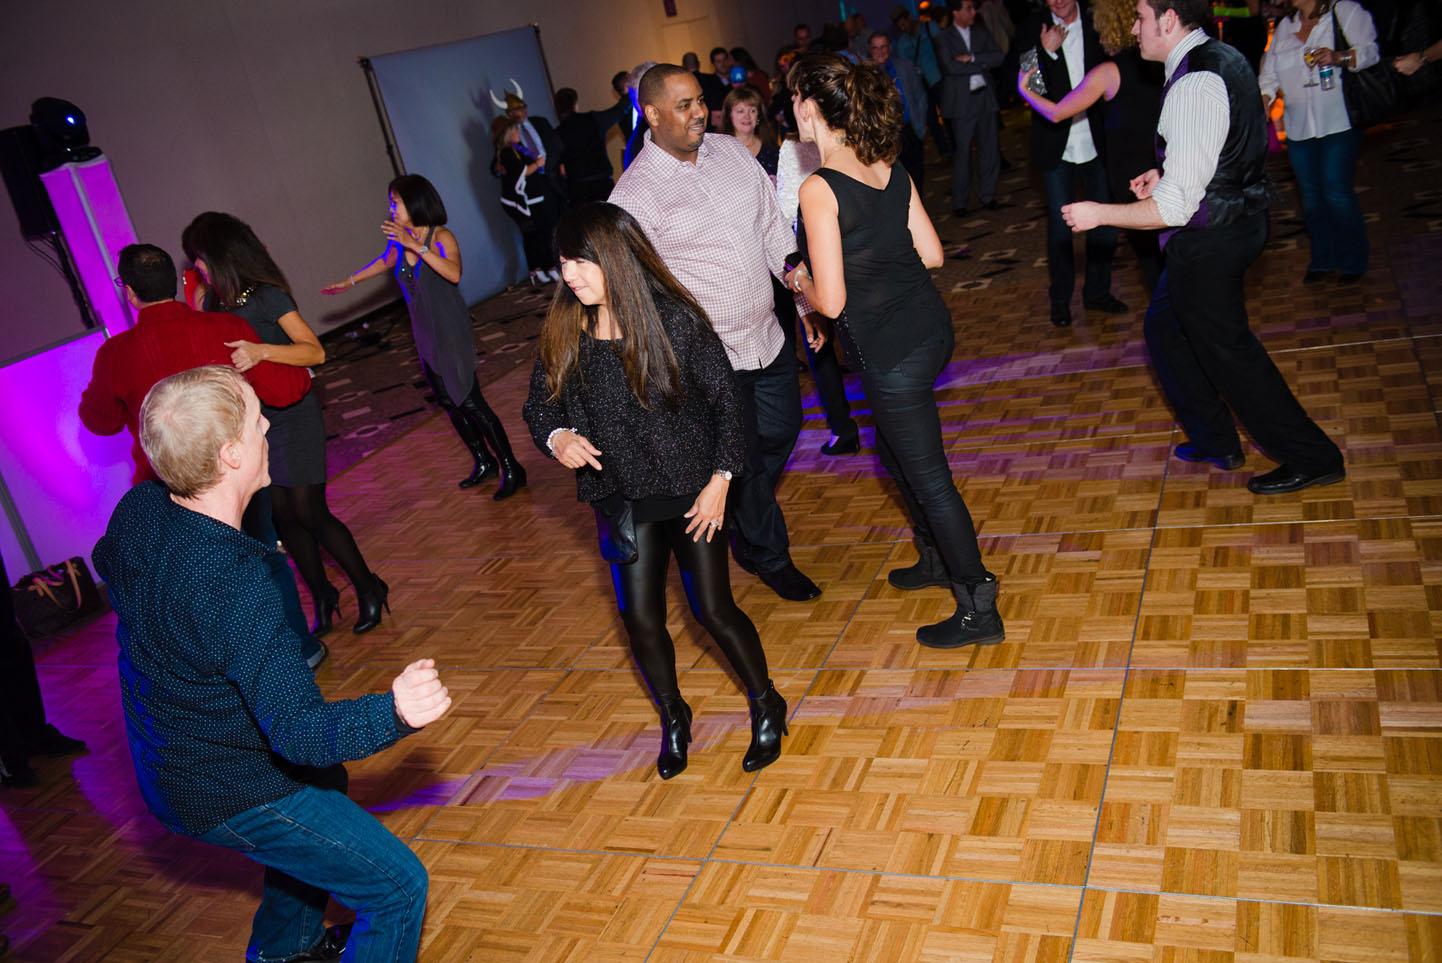 2015-12-09 ReMax Corpoarte Event - The Borgata - Atlantic City NJ - Photo Sesh - 2015-5197.jpg